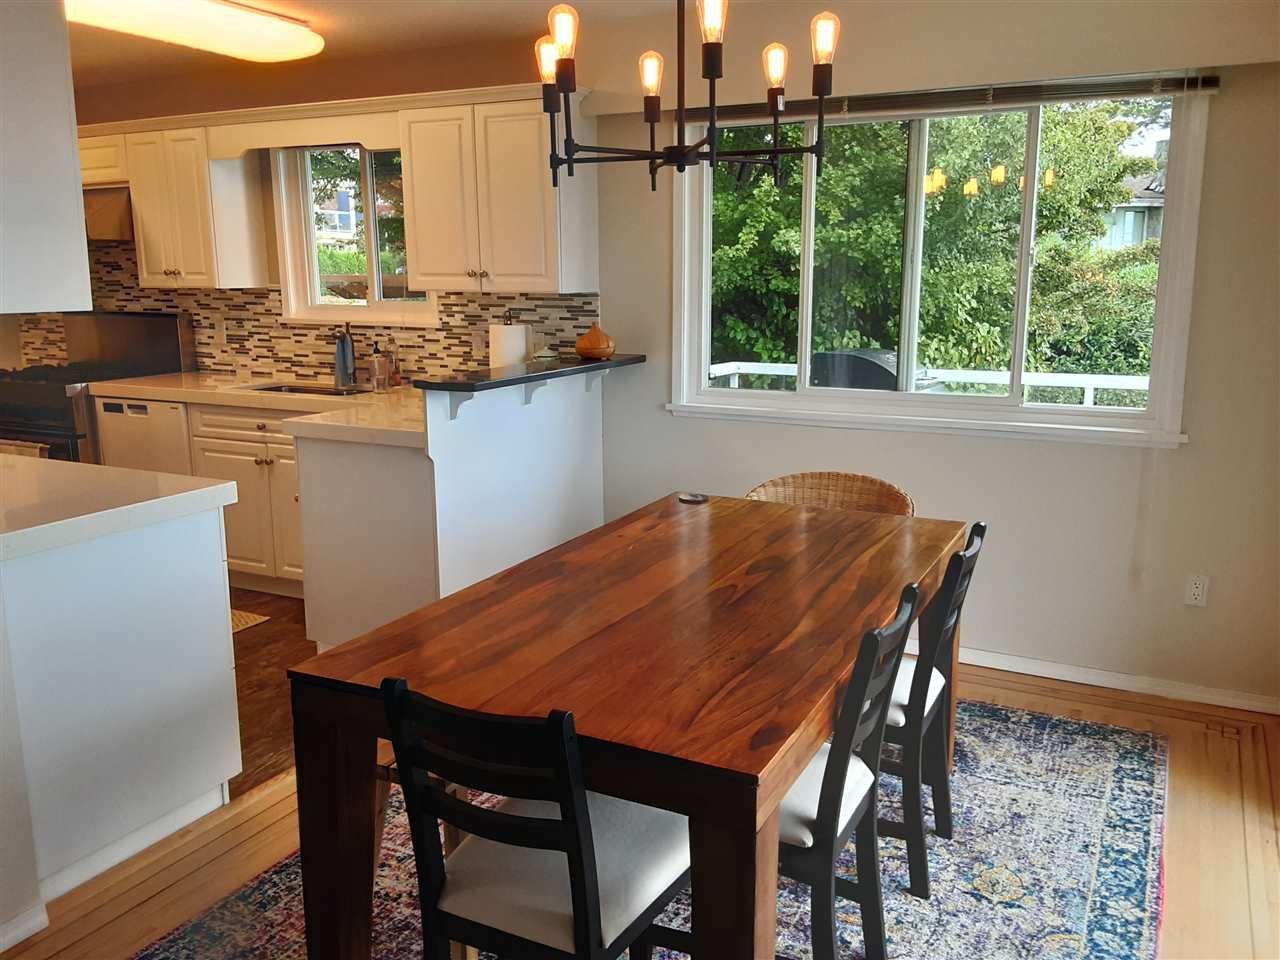 Photo 9: Photos: 15291 COLUMBIA Avenue: White Rock House for sale (South Surrey White Rock)  : MLS®# R2492863